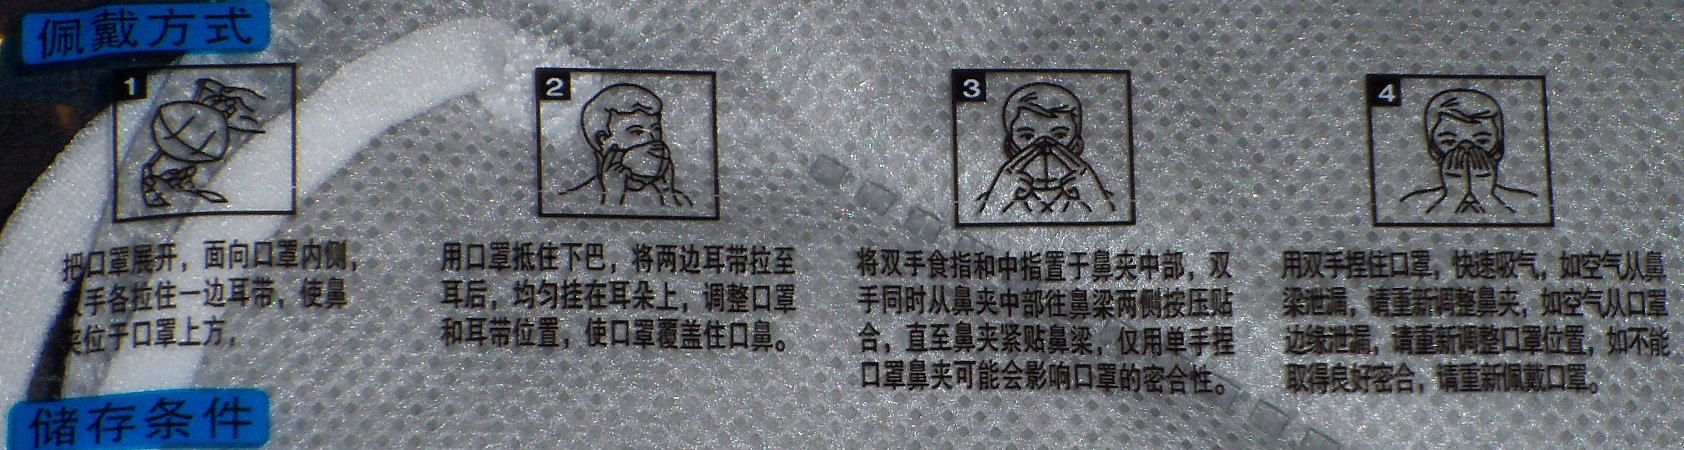 mask-instructions.jpg.6c4a8bc8fff2800fa51d154a568056e9.jpg